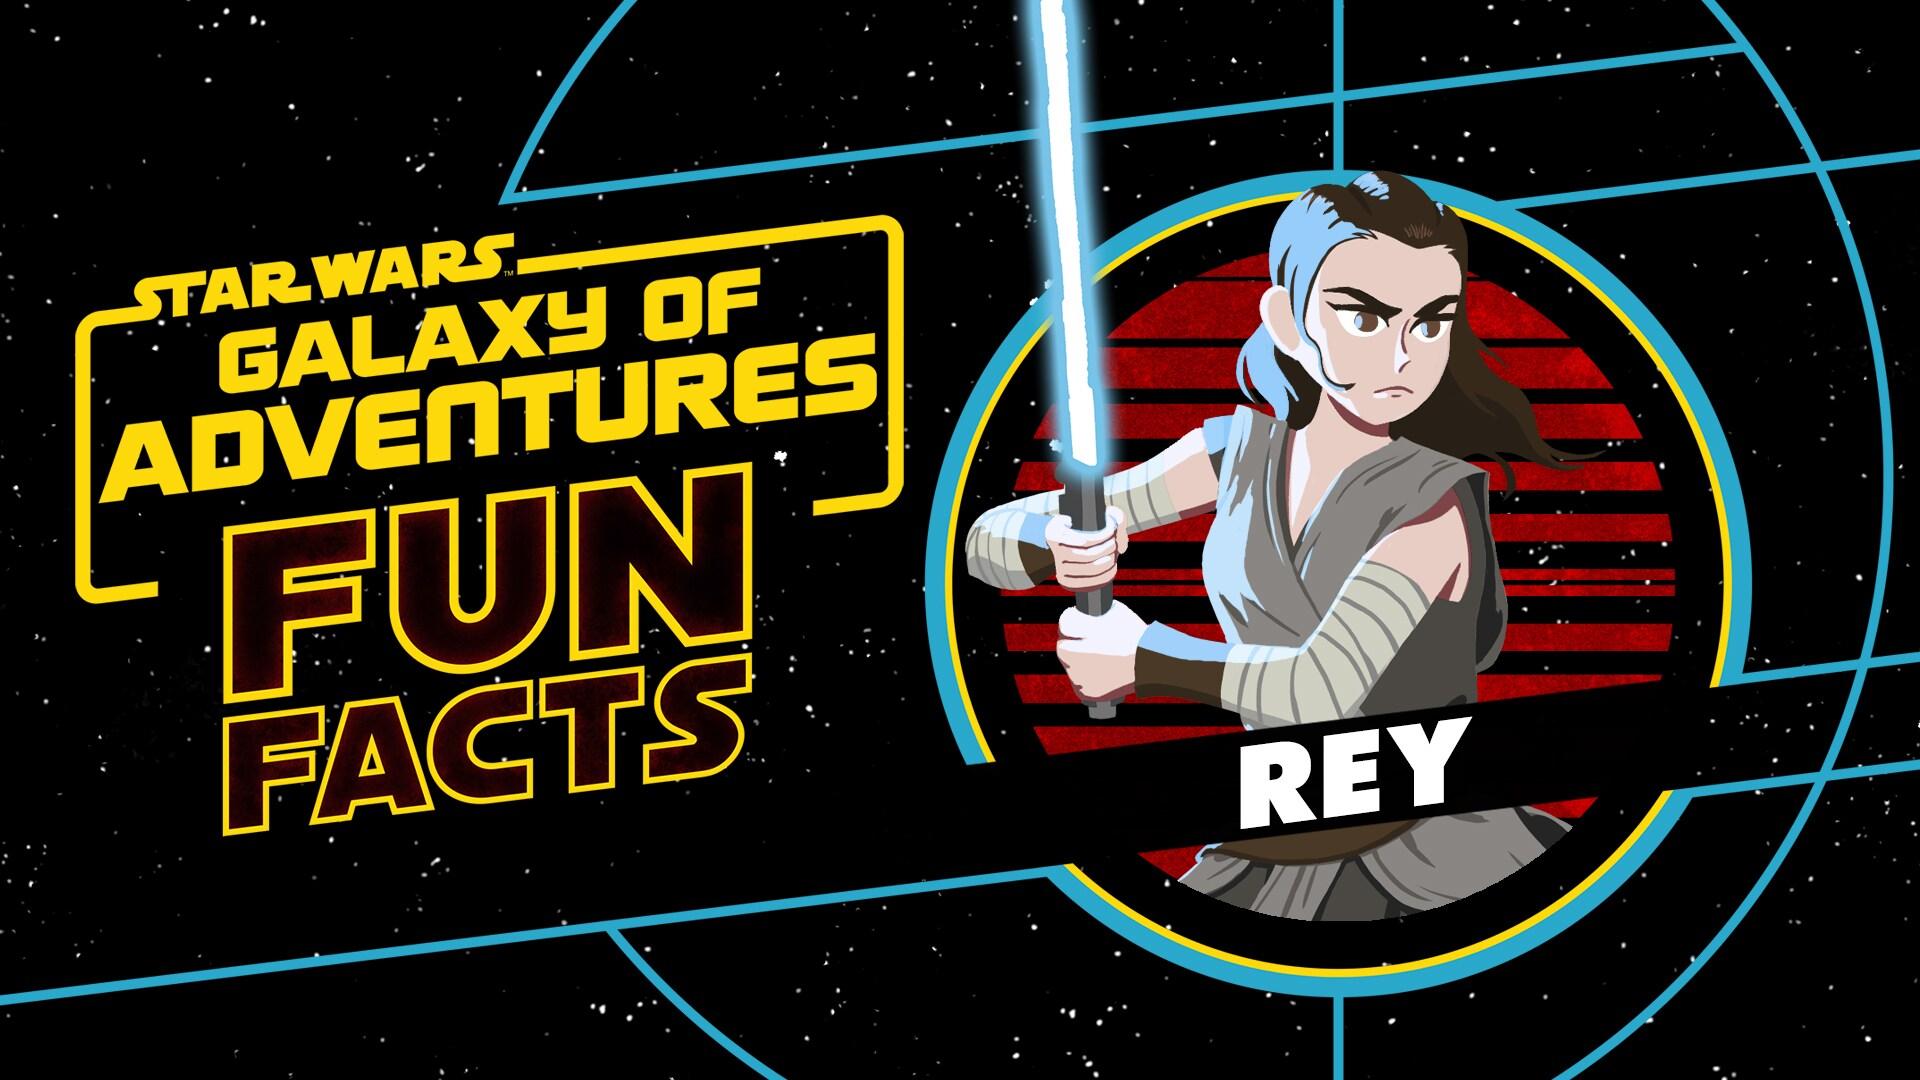 Rey | Star Wars Galaxy of Adventures Fun Facts